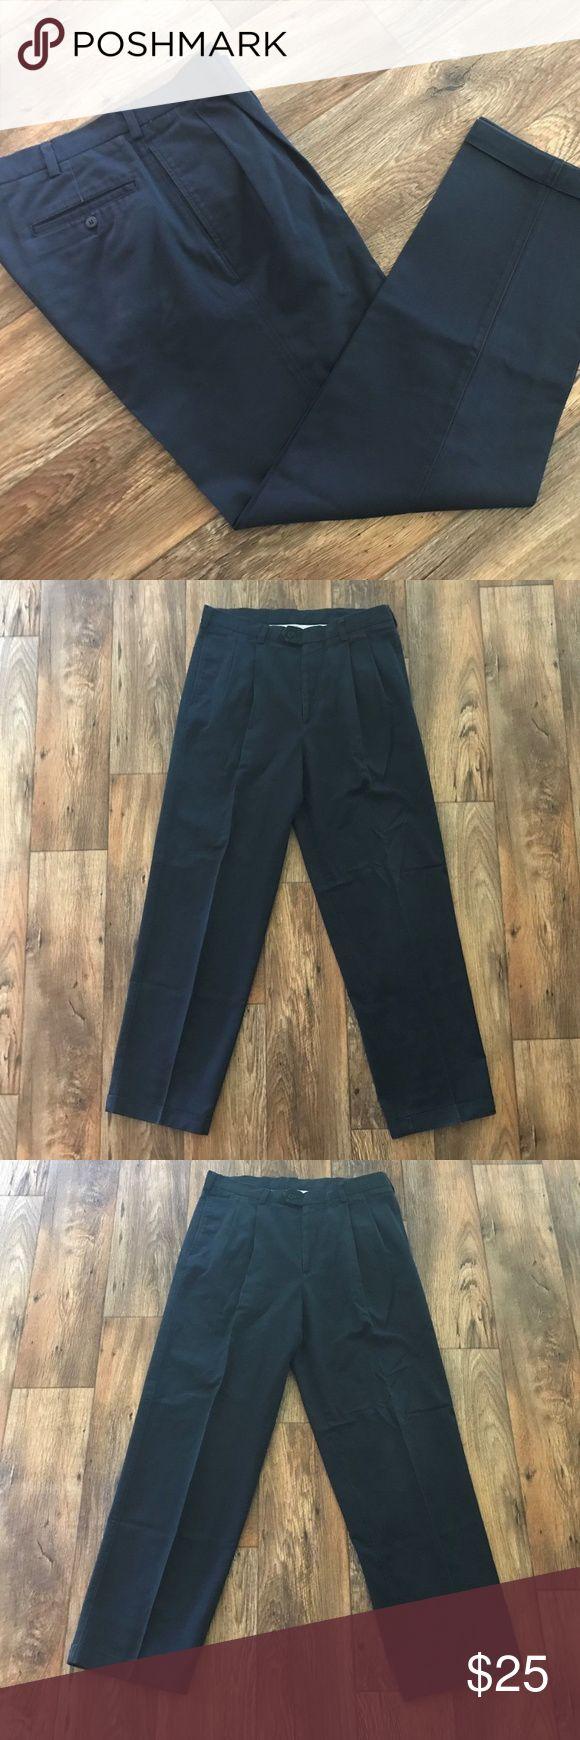 Savane Mens Dress Pant %100 Cotton Navy Blue Dress Savane Mens Dress Pant %100 Cotton Navy Blue Trouser Size 34X32  Brand:Savane  Color: Navy  Size: 34X32  Pre-owned  in good condition Savane Pants Dress